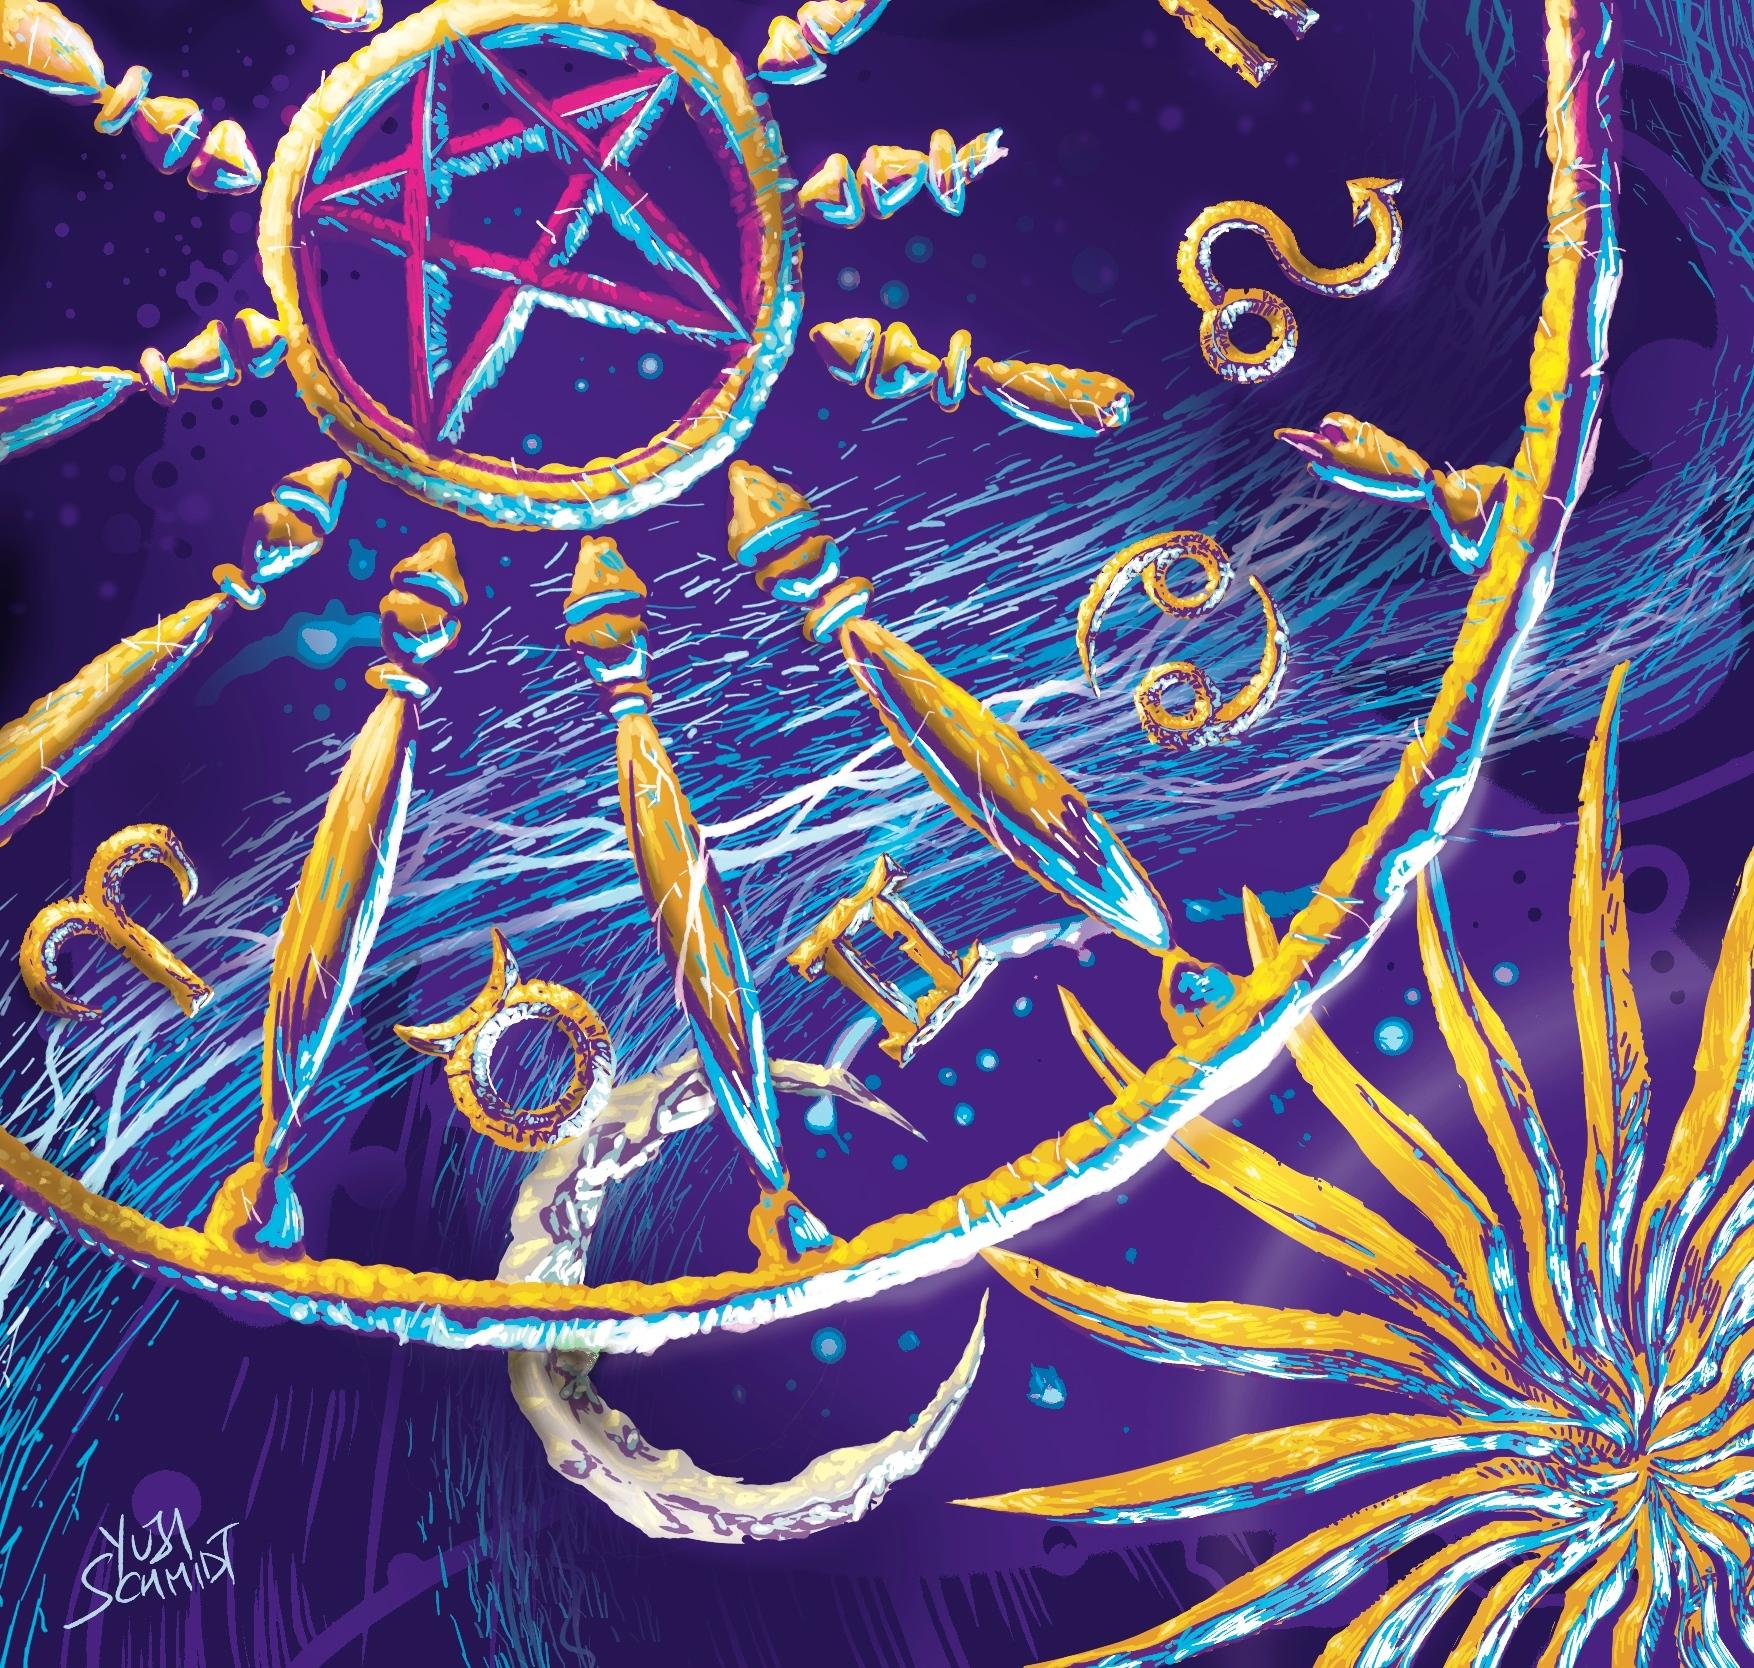 Astrologia / Astrology